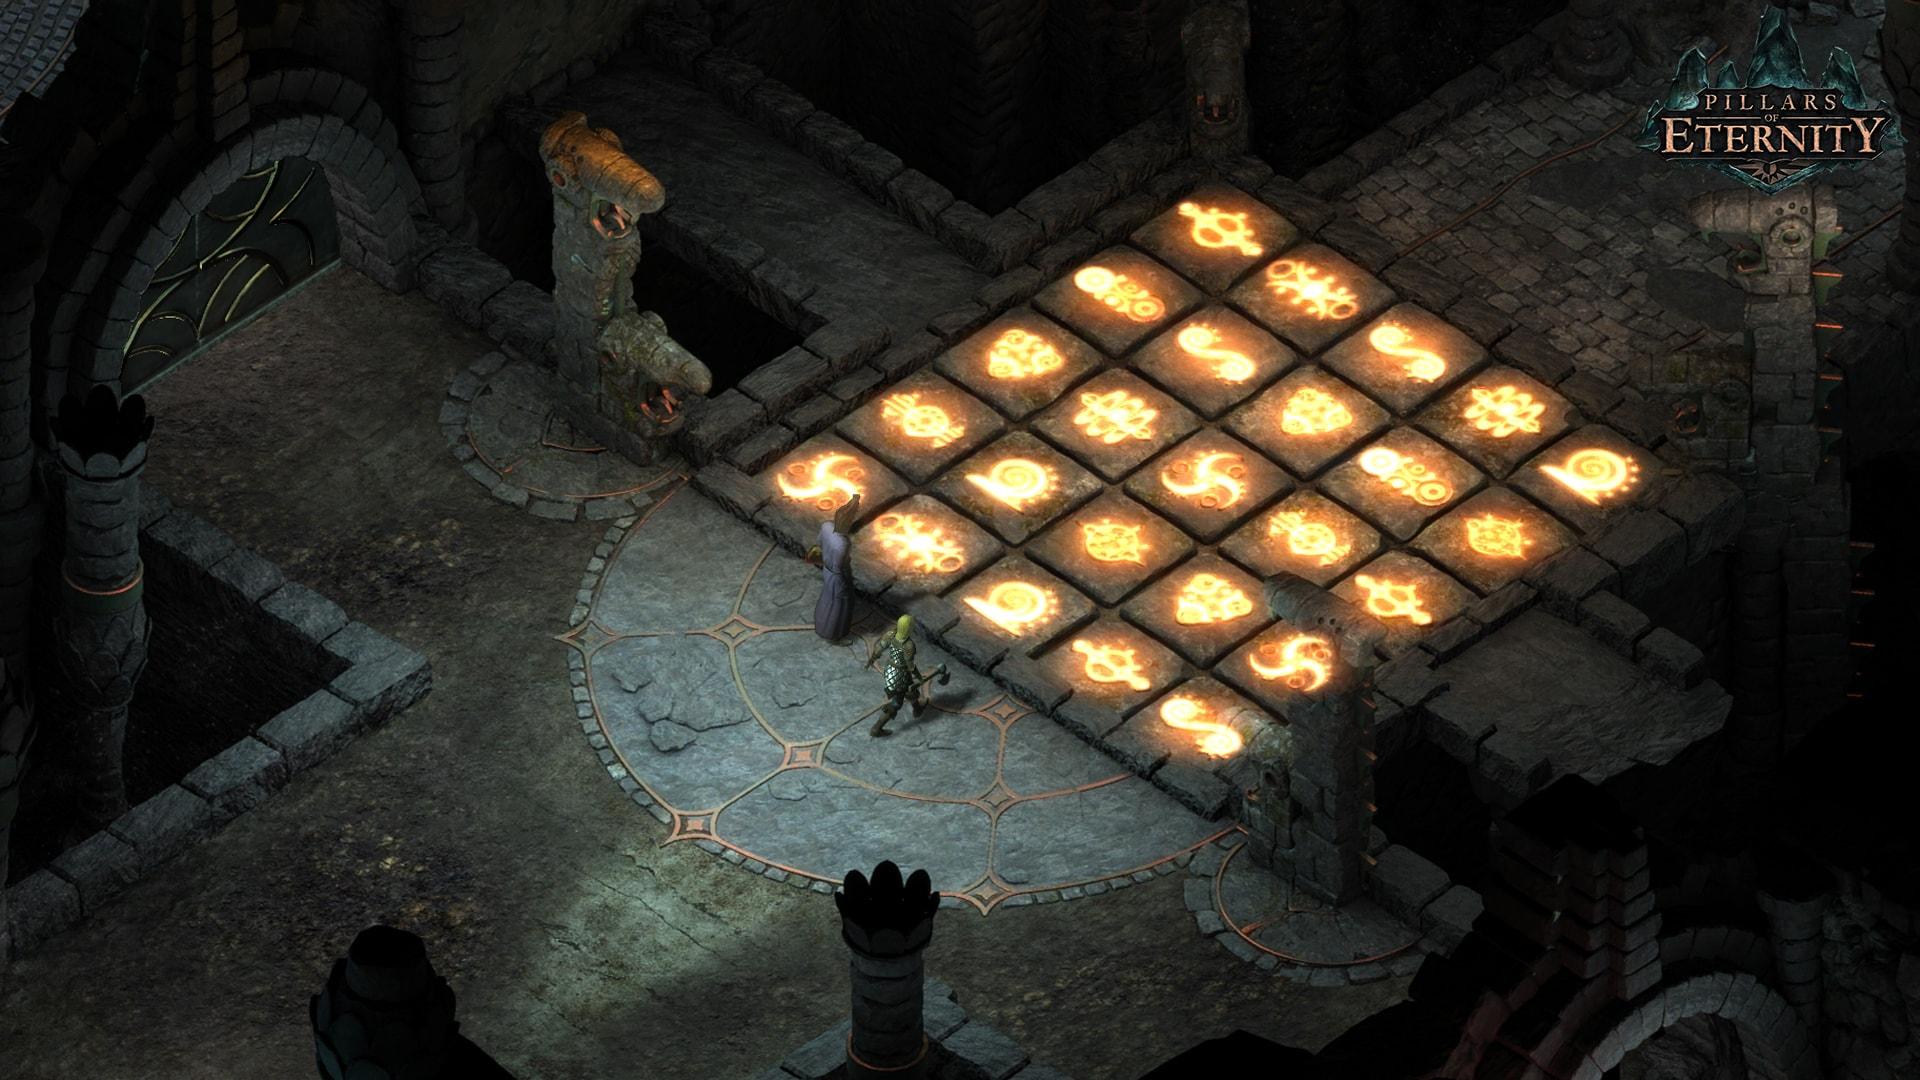 Pillars of Eternity - Hero Edition Steam Key GLOBAL - 3